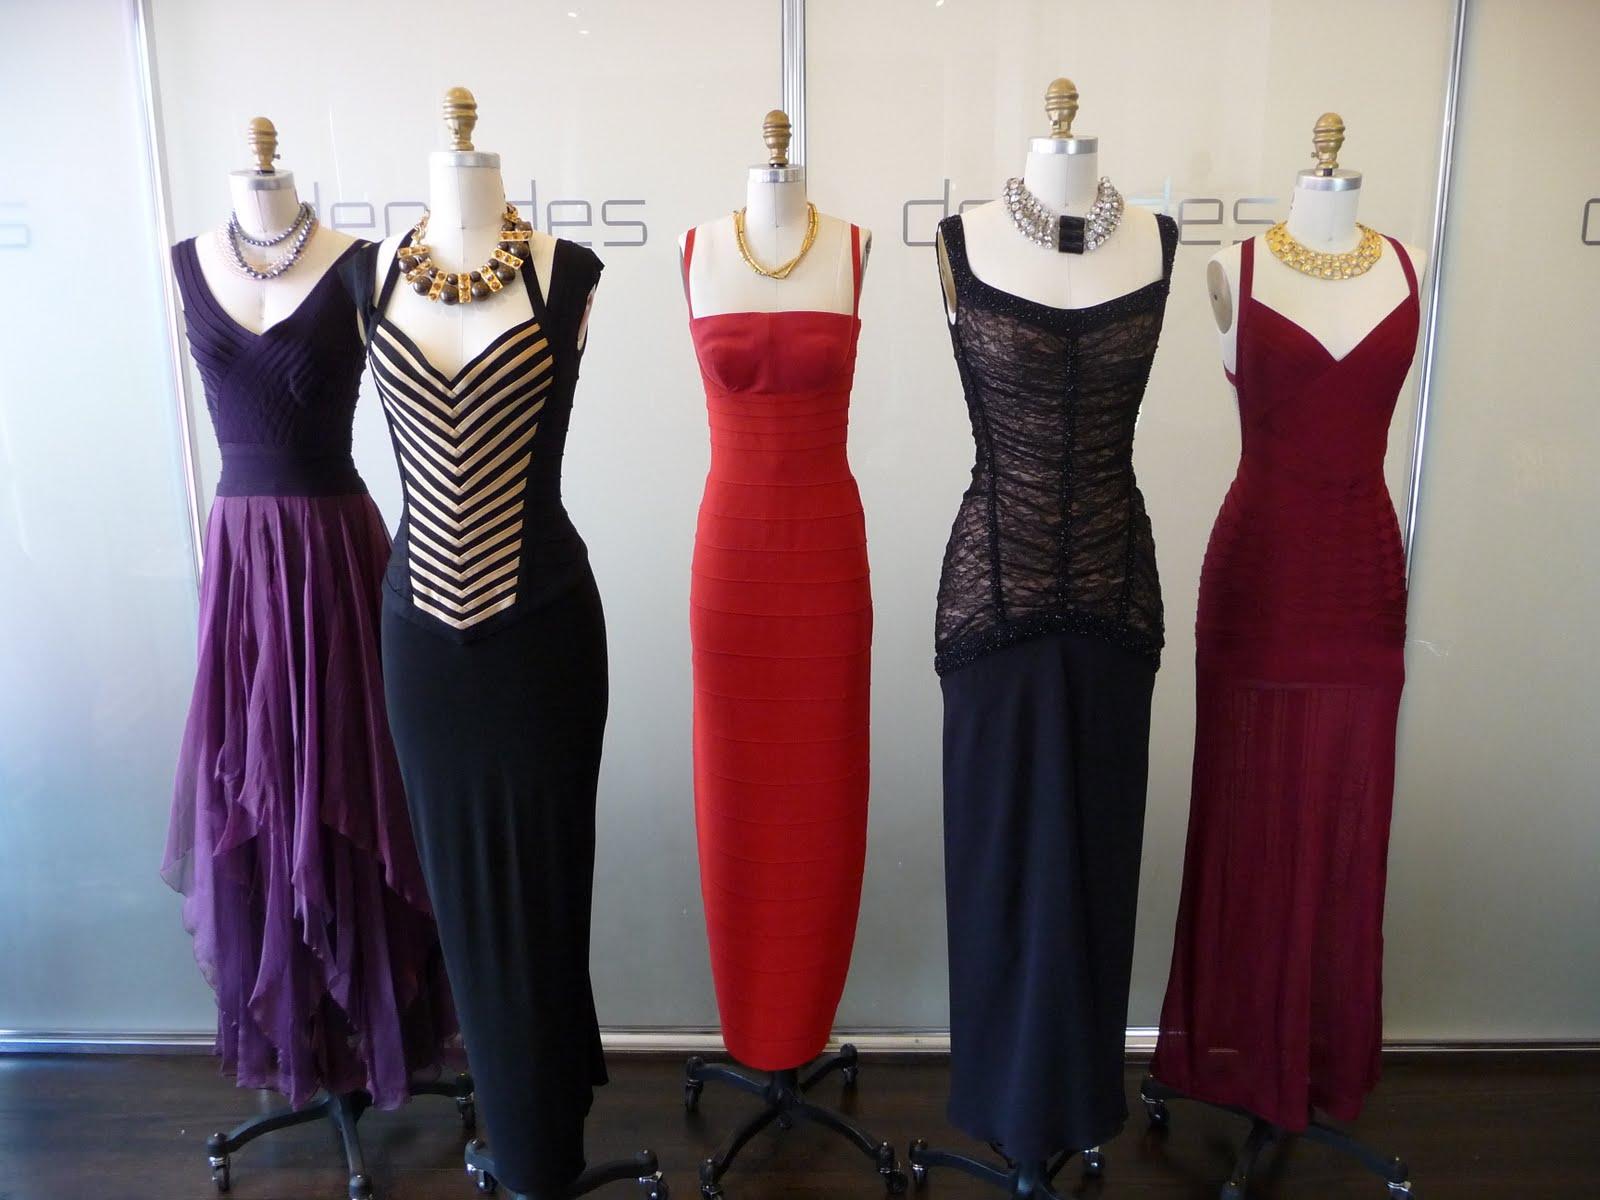 Dlugie sukienki na wesele (4)